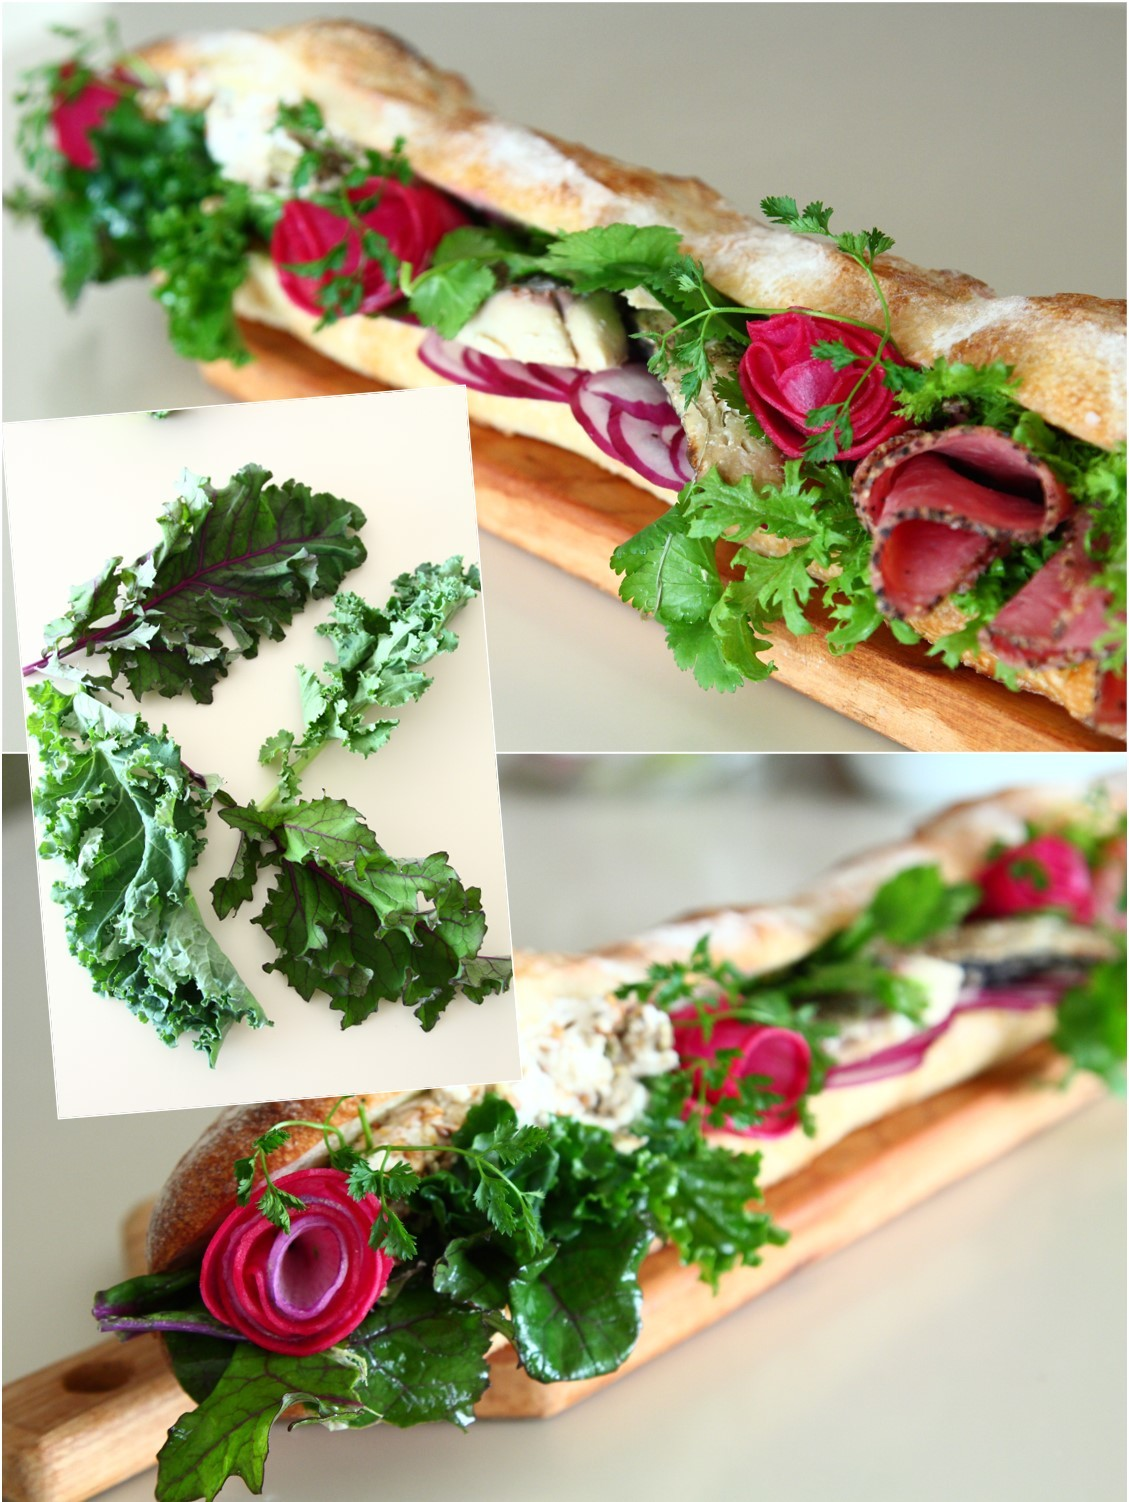 Sandwich Picnic_a0107981_09055110.jpg